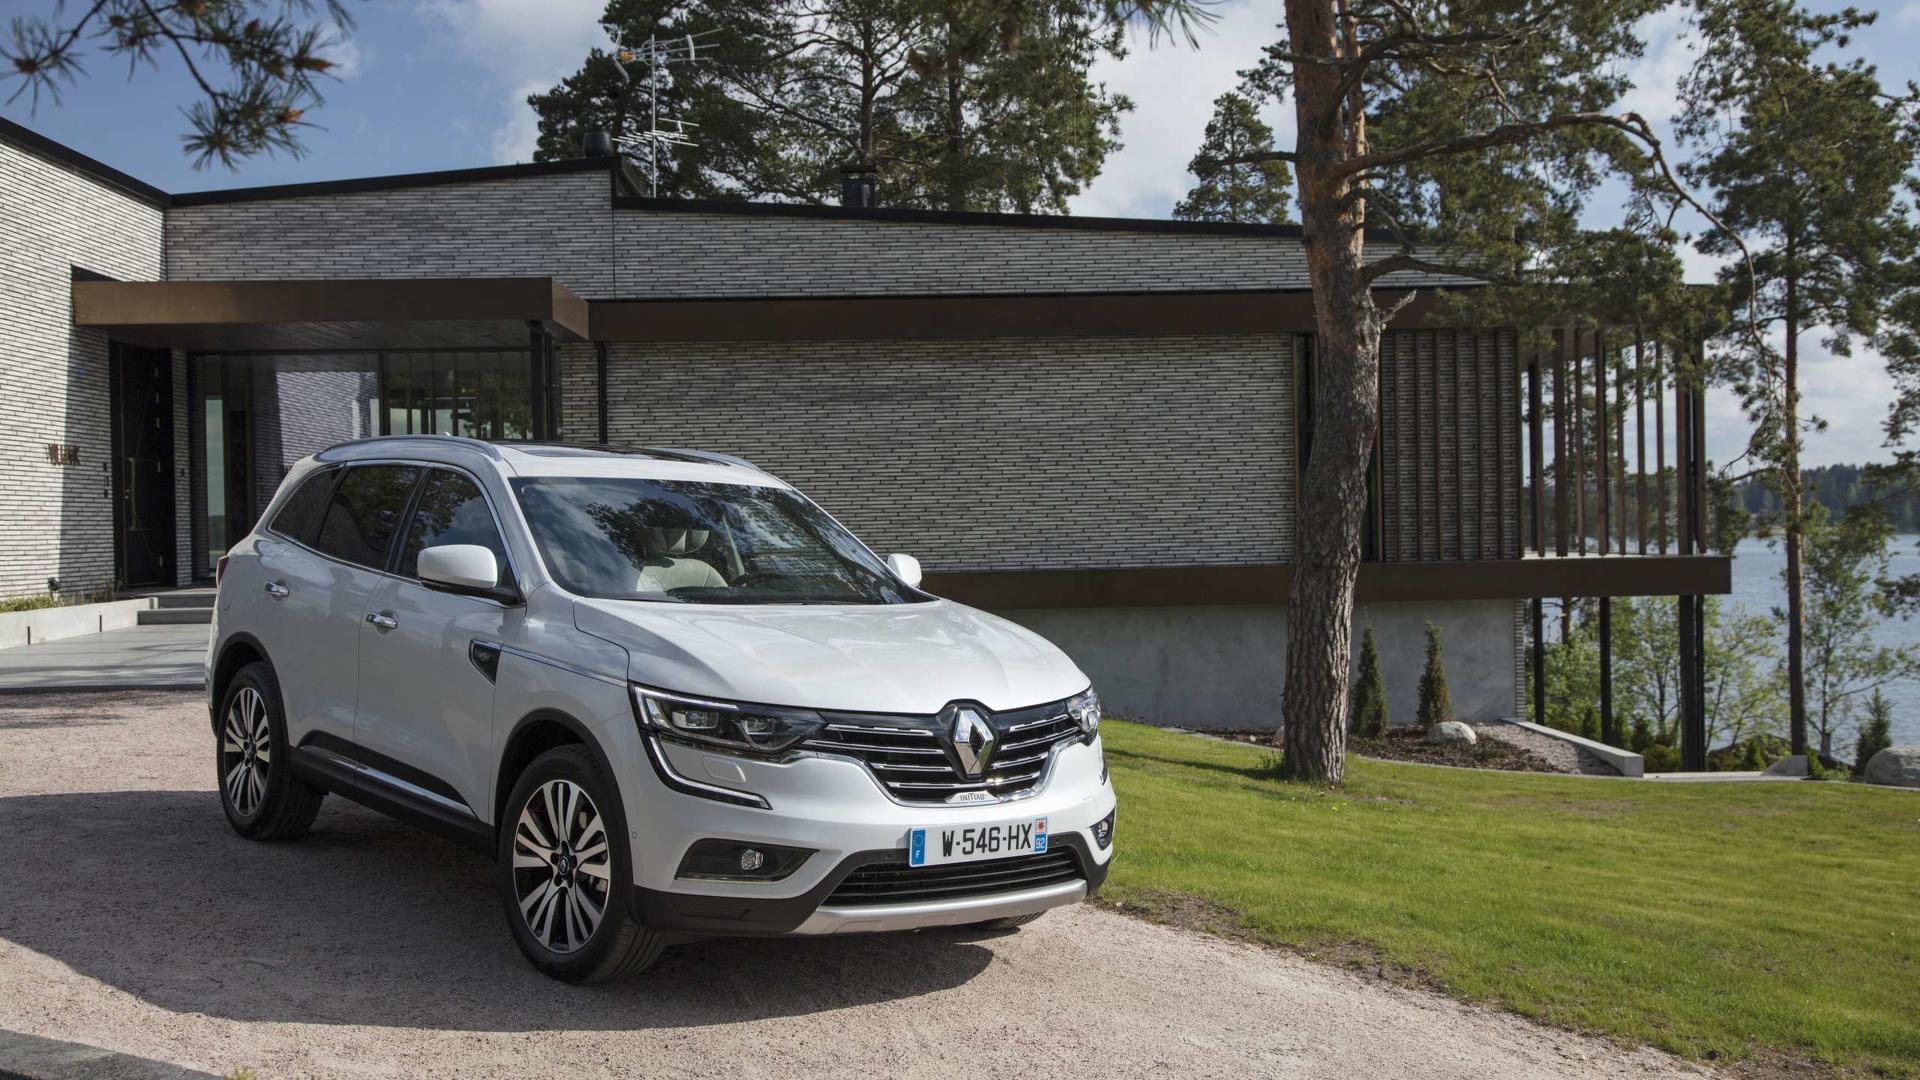 2017 Renault Koleos review: Fine car, but not class best